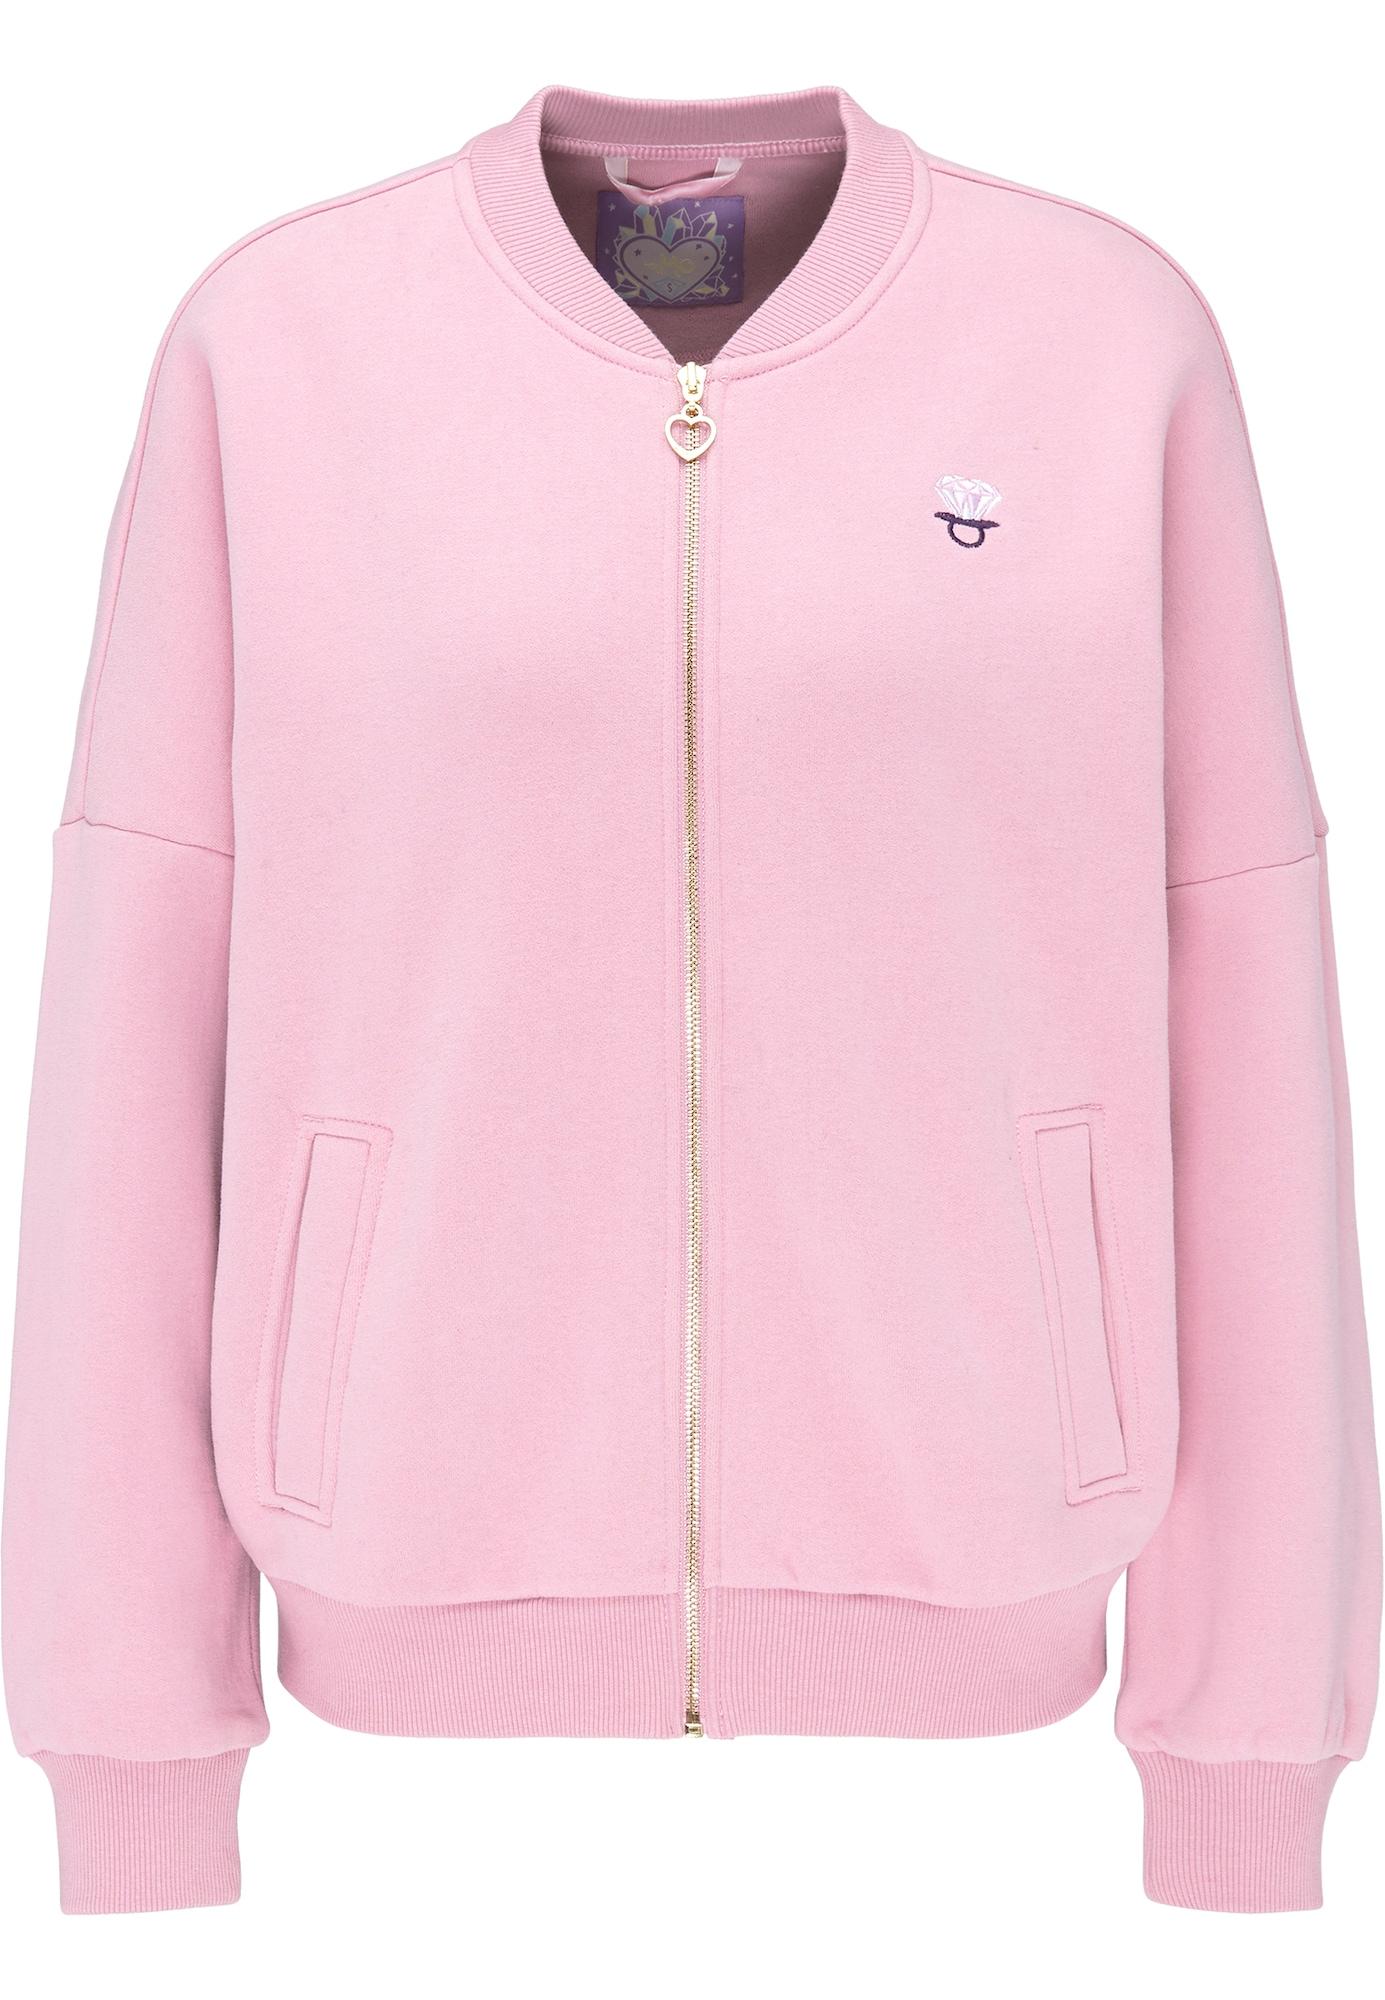 Sweatjacke | Bekleidung > Sweatshirts & -jacken > Sweatjacken | Pink | MYMO